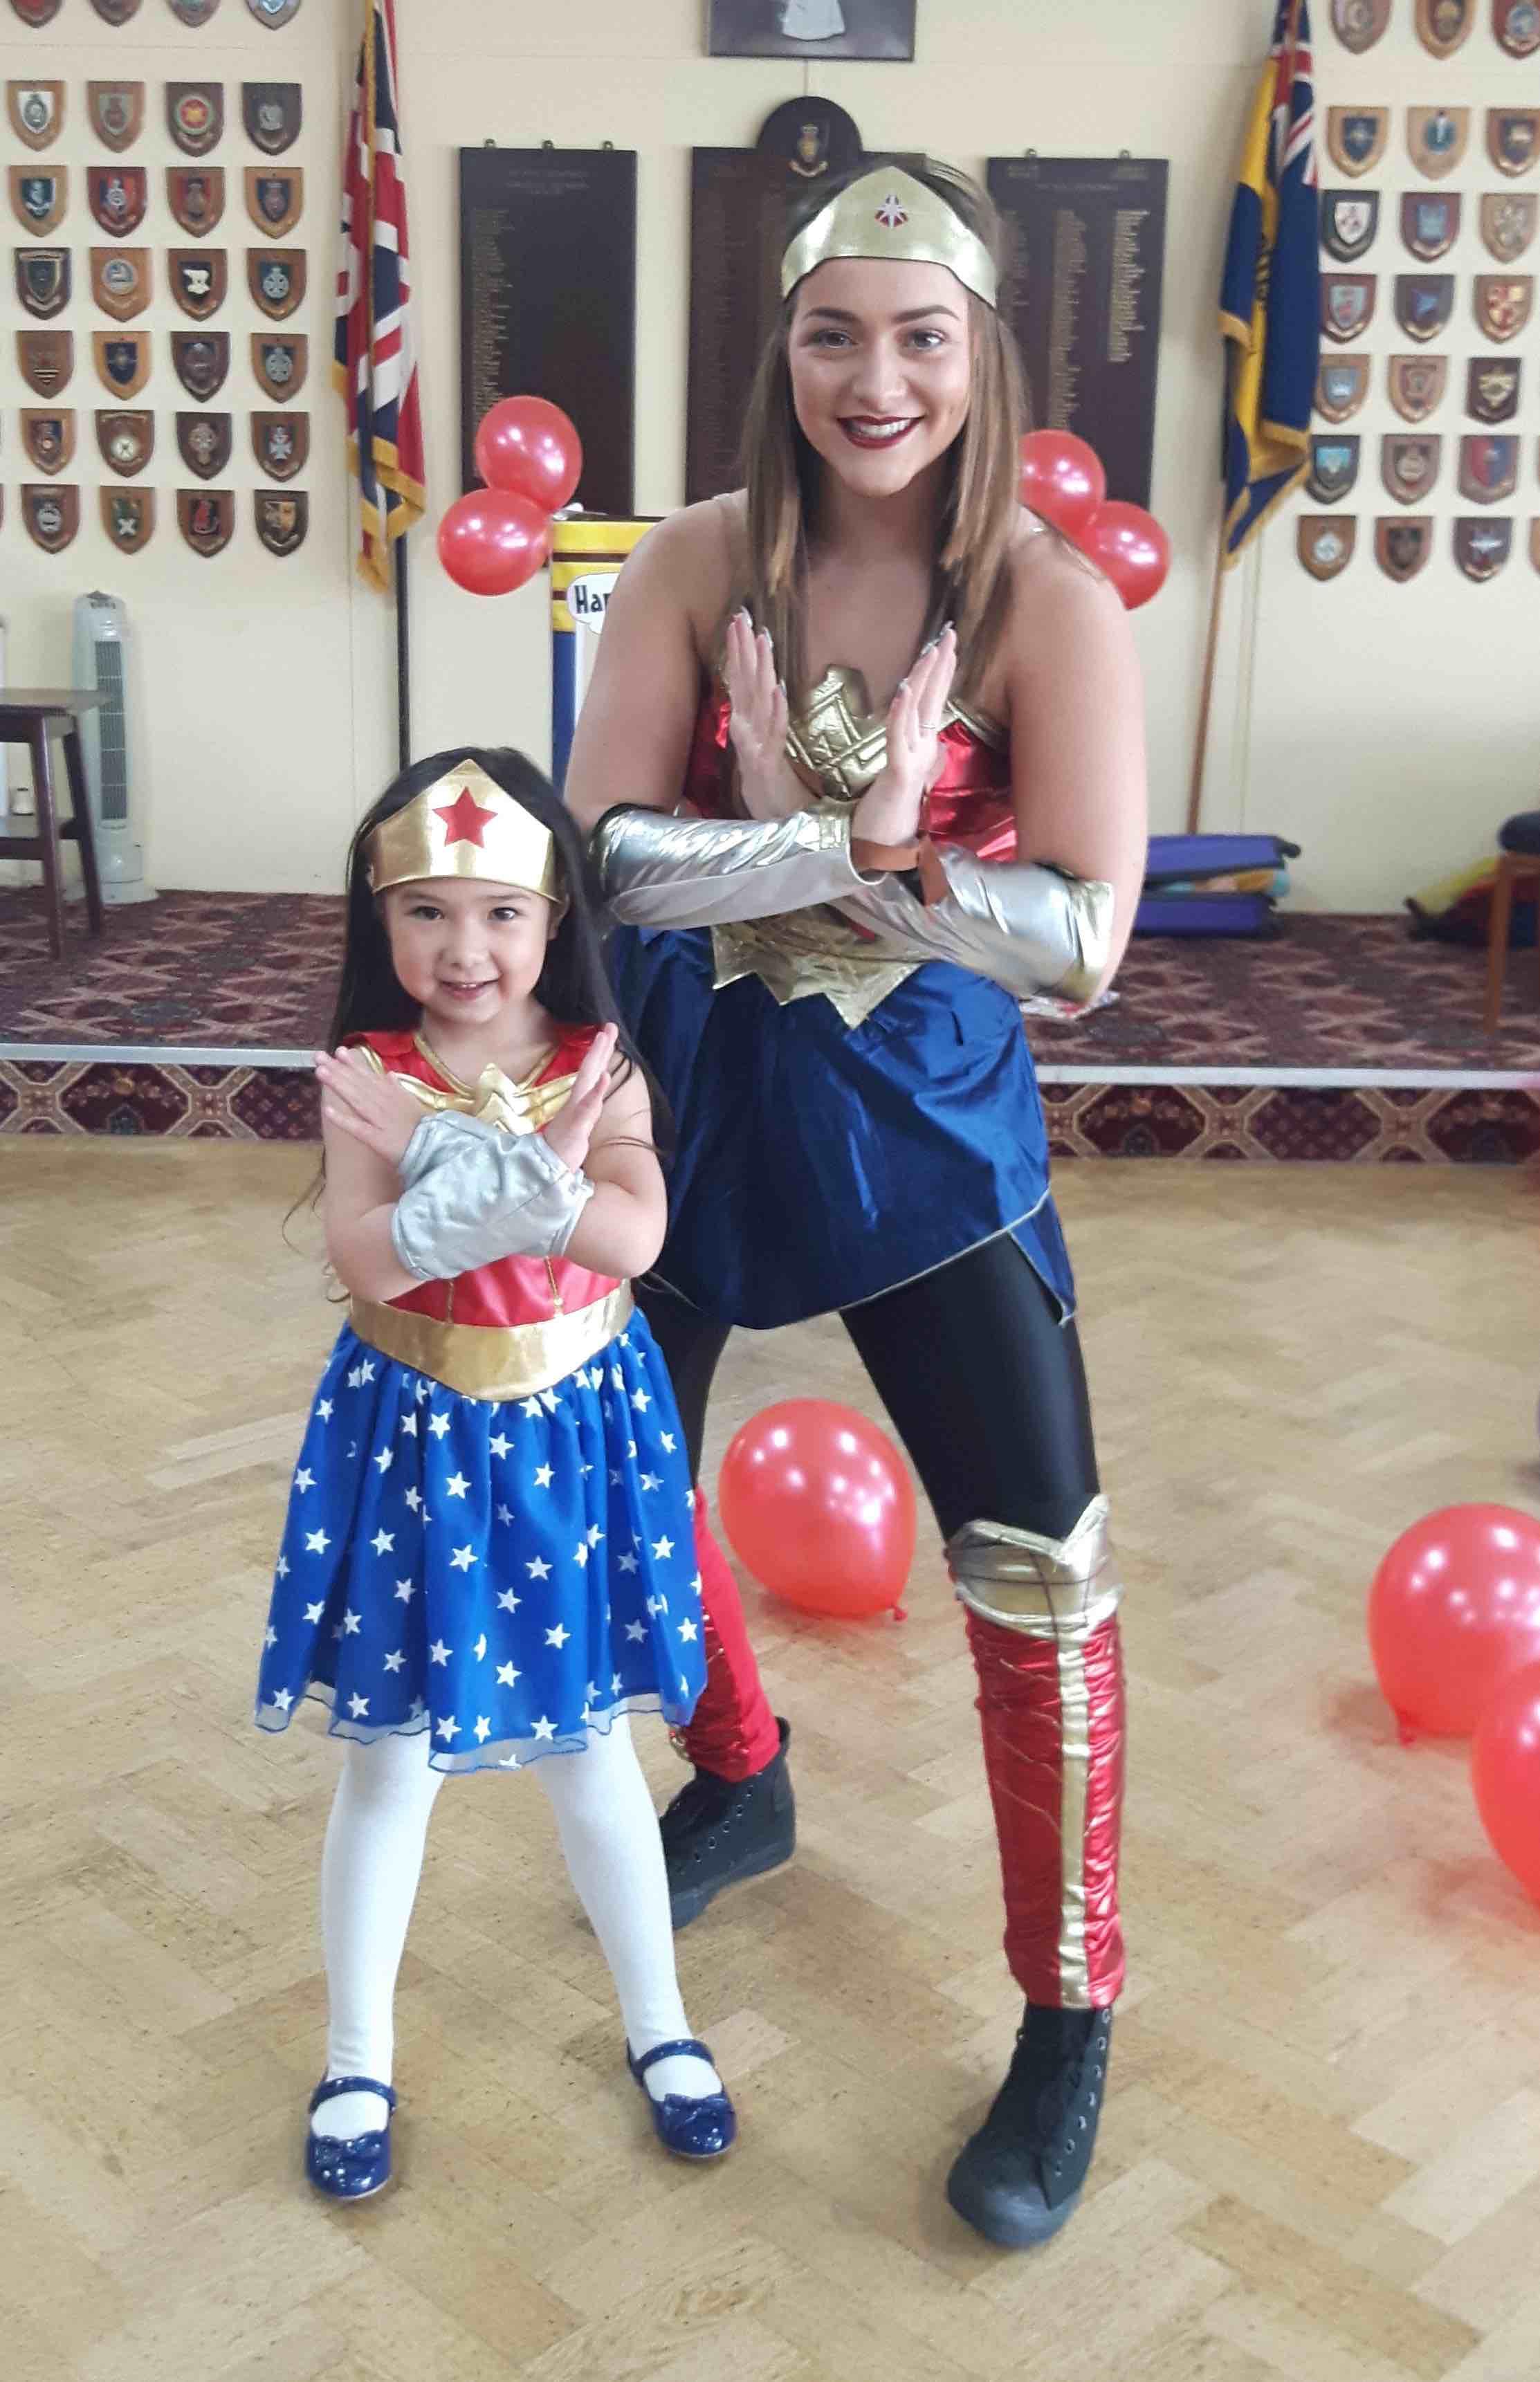 Wonderwoman pic